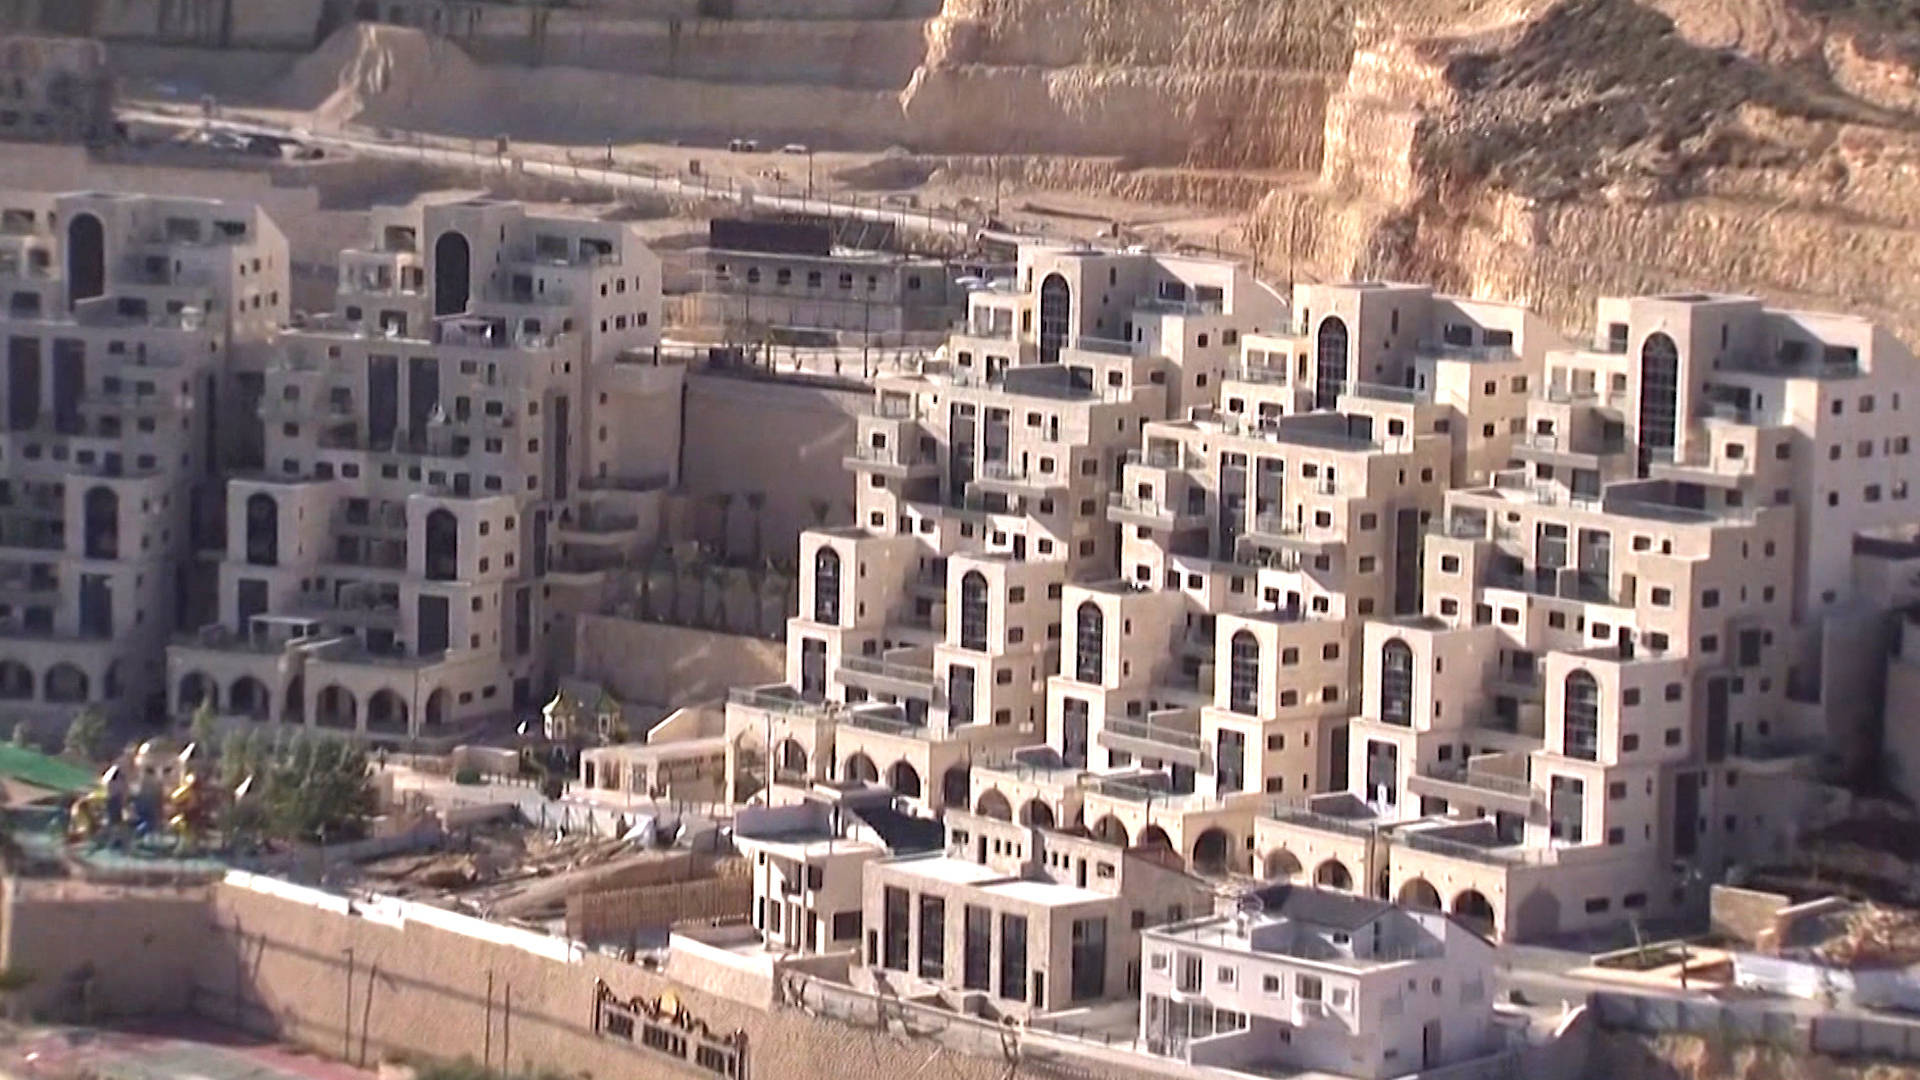 U.N. Affirms It Still Considers Israeli Settlements Violation of International Law